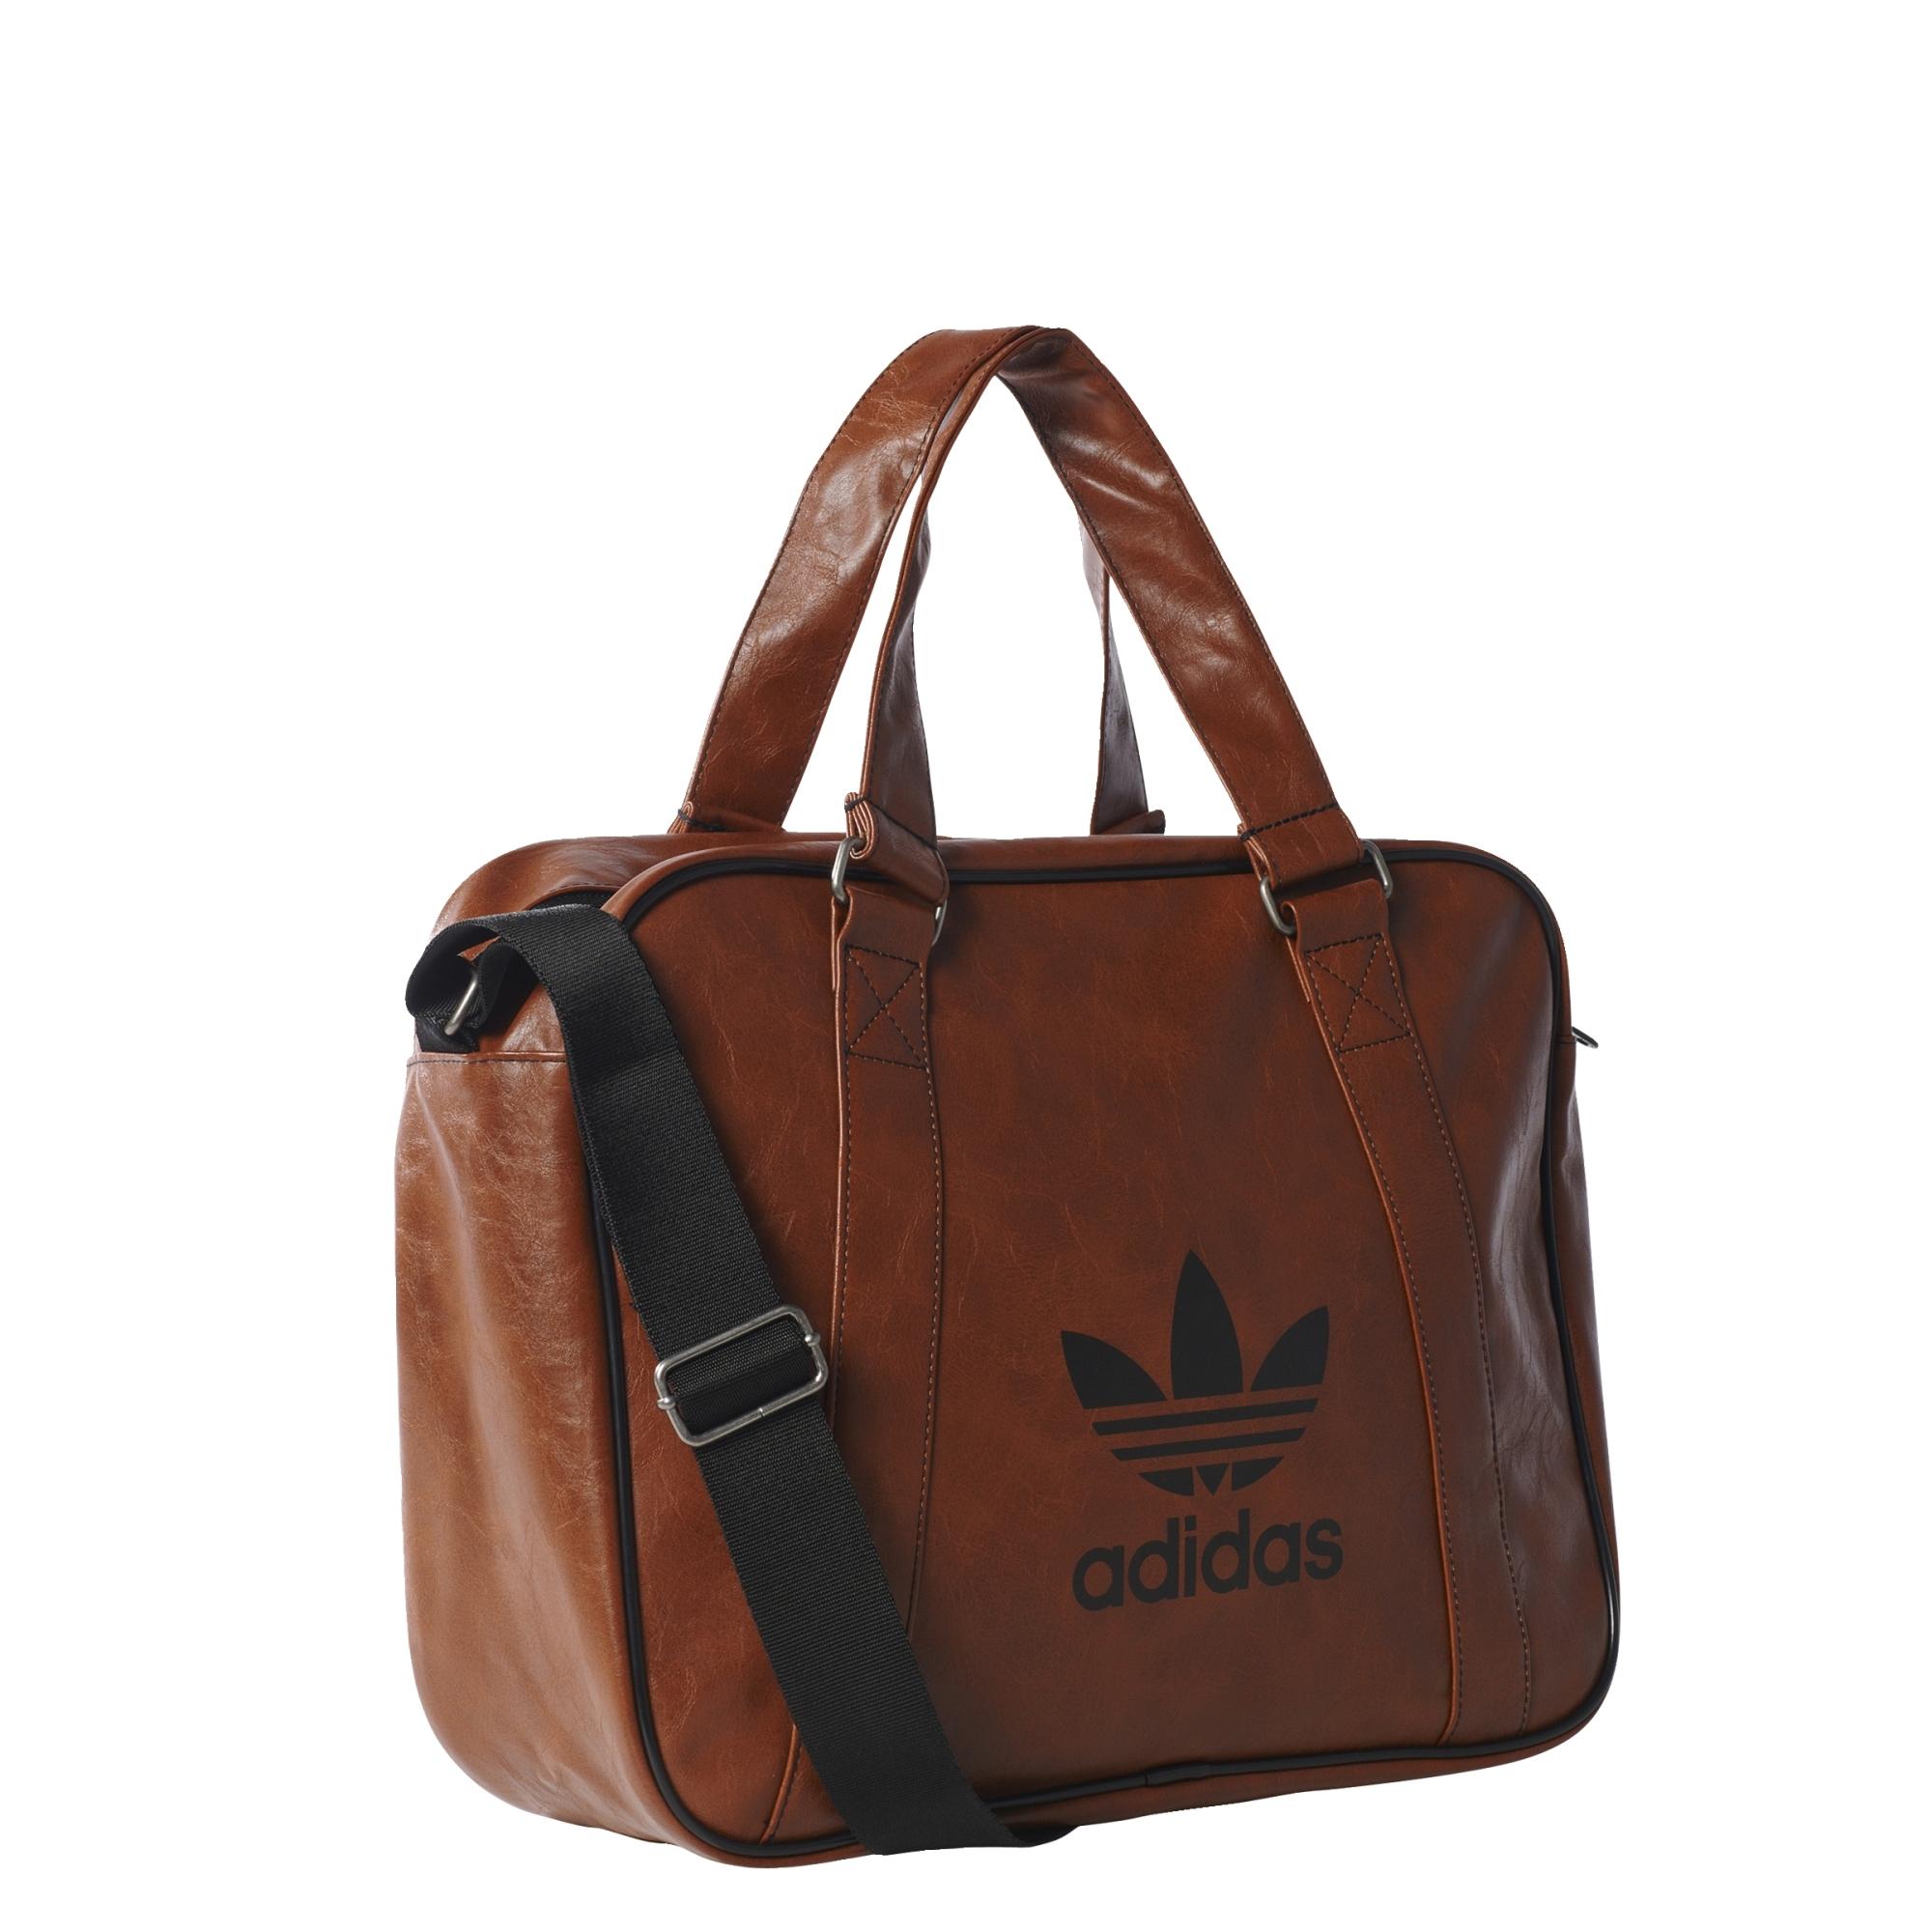 30f2537fa52f Adidas Originals Vintage Airliner Bag (dust rust). Oferta 15%